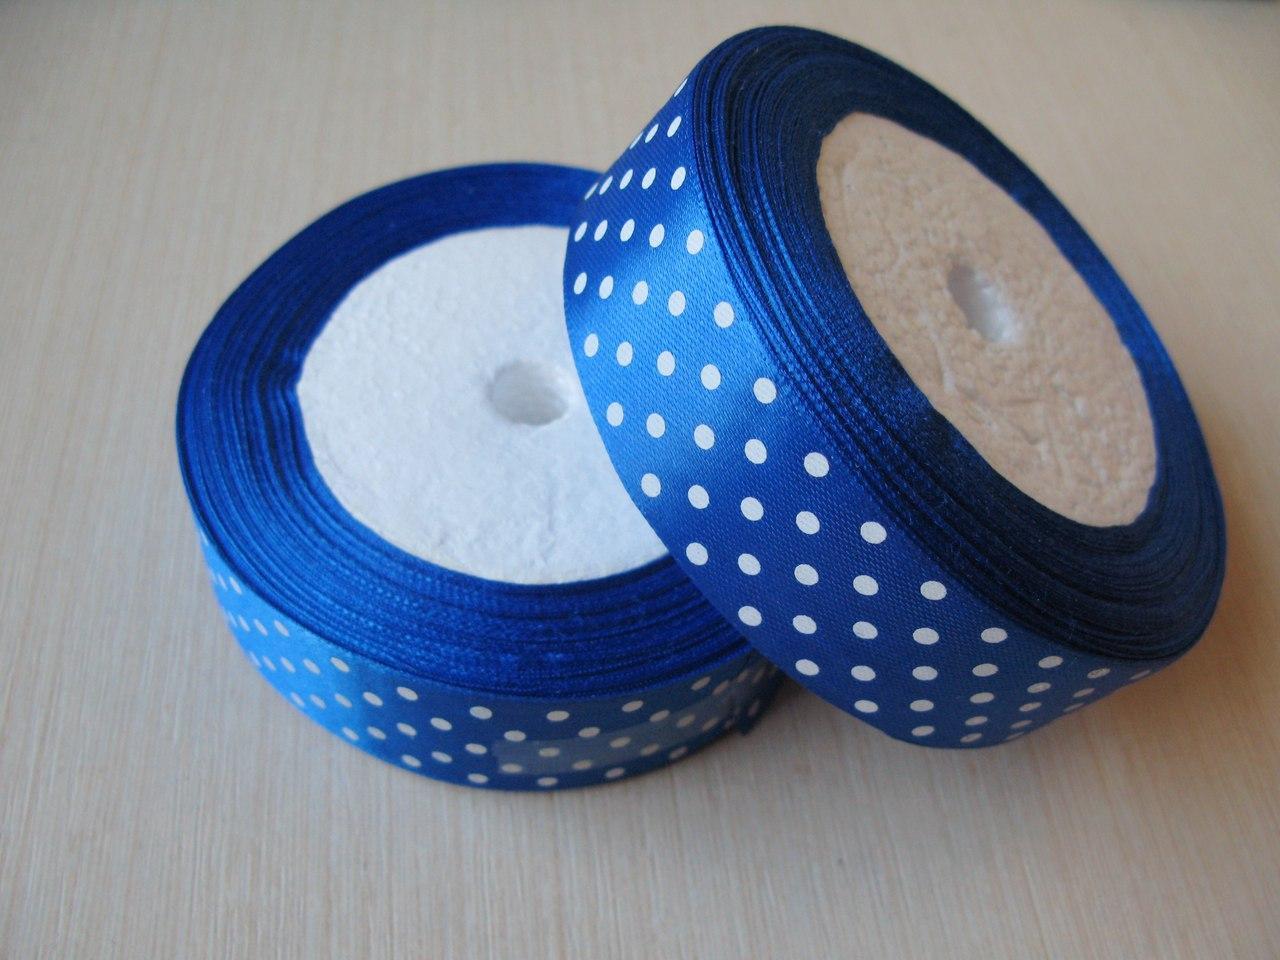 Лента в горох 2.5 см цвет - синий. Бобина 23 м.